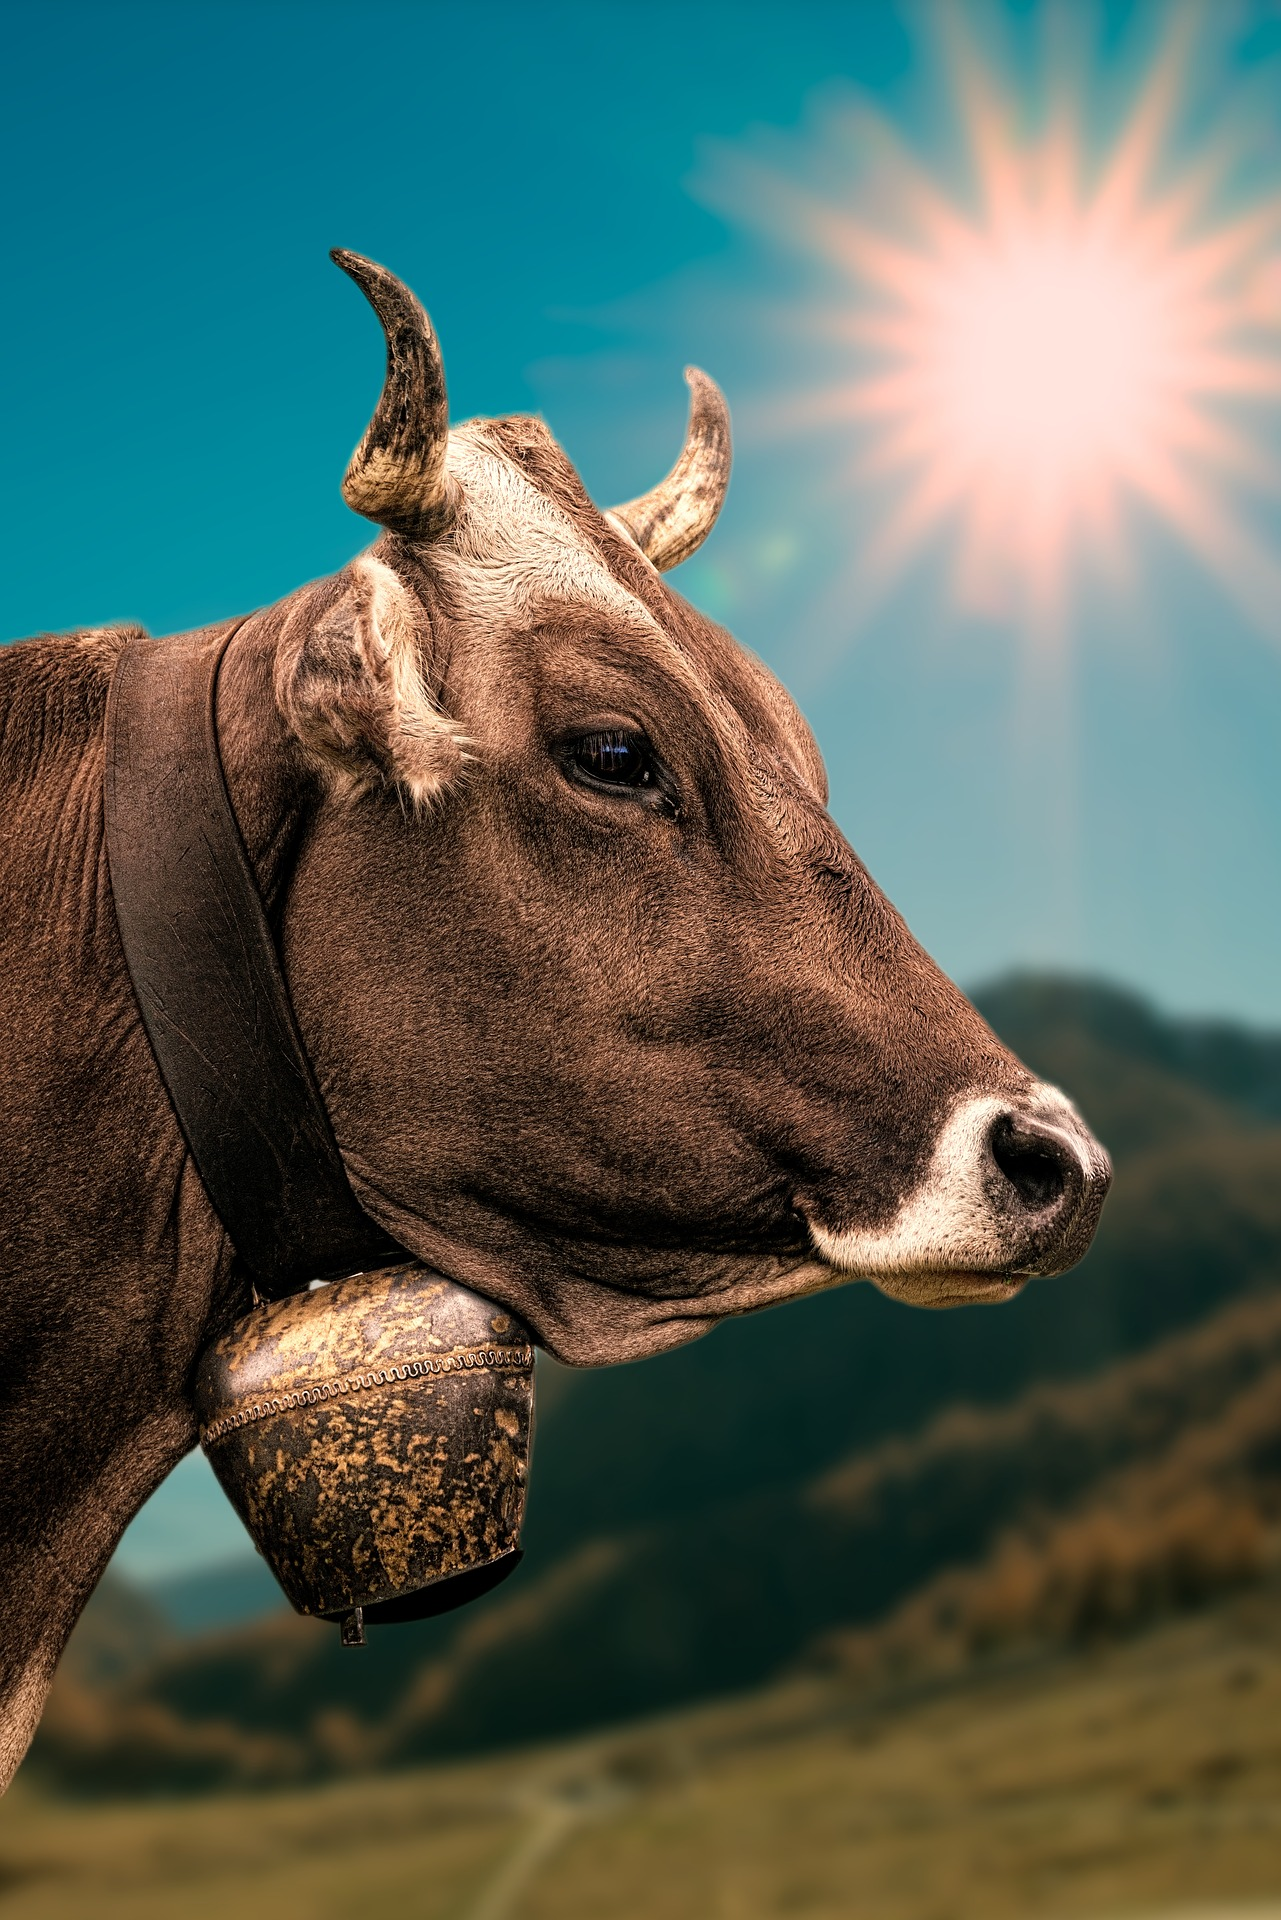 cow-2193018_1920.jpg